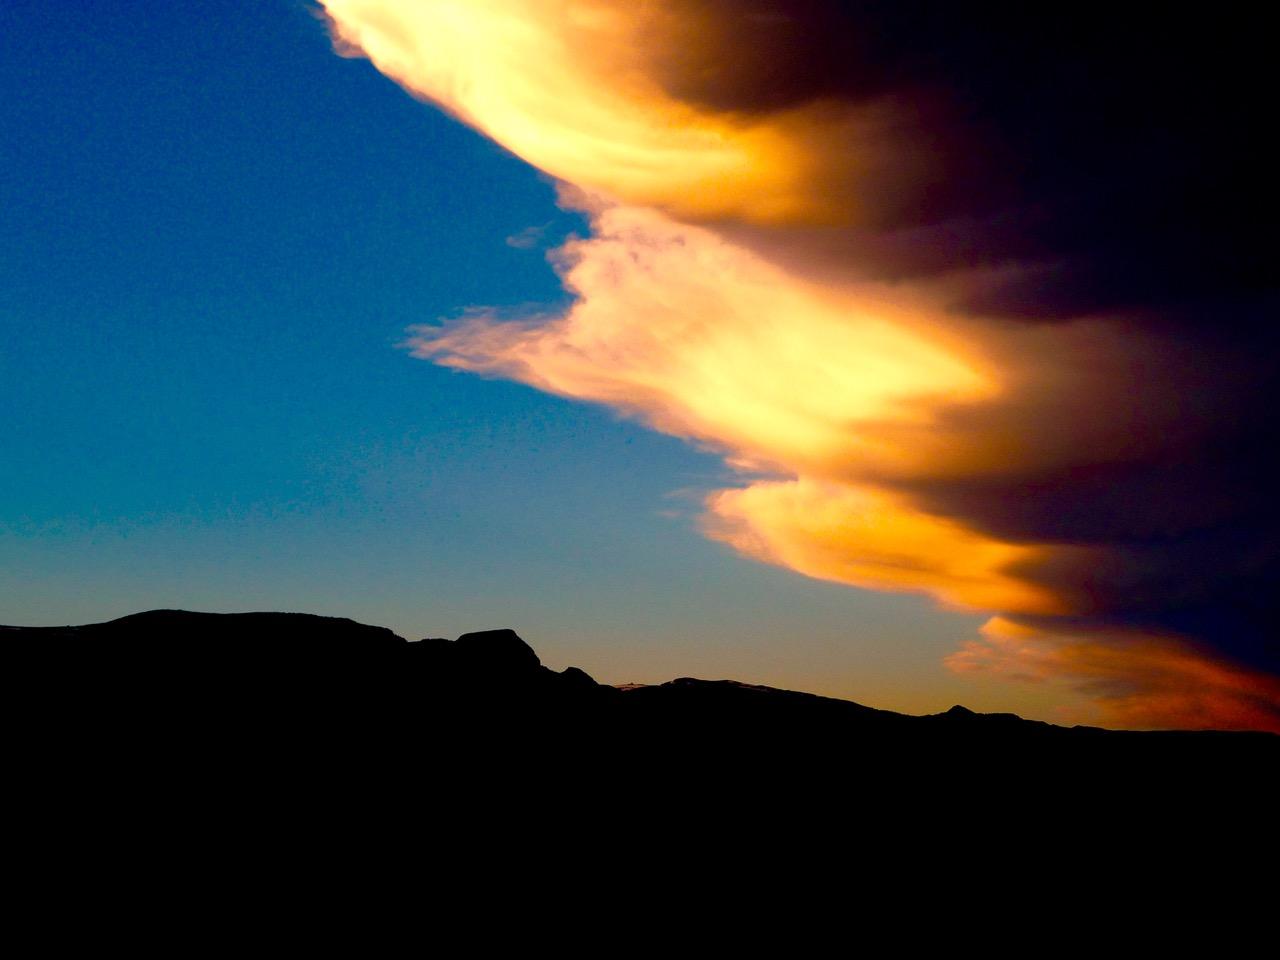 Big Horn Mountains, Wyoming, USA, 2011.